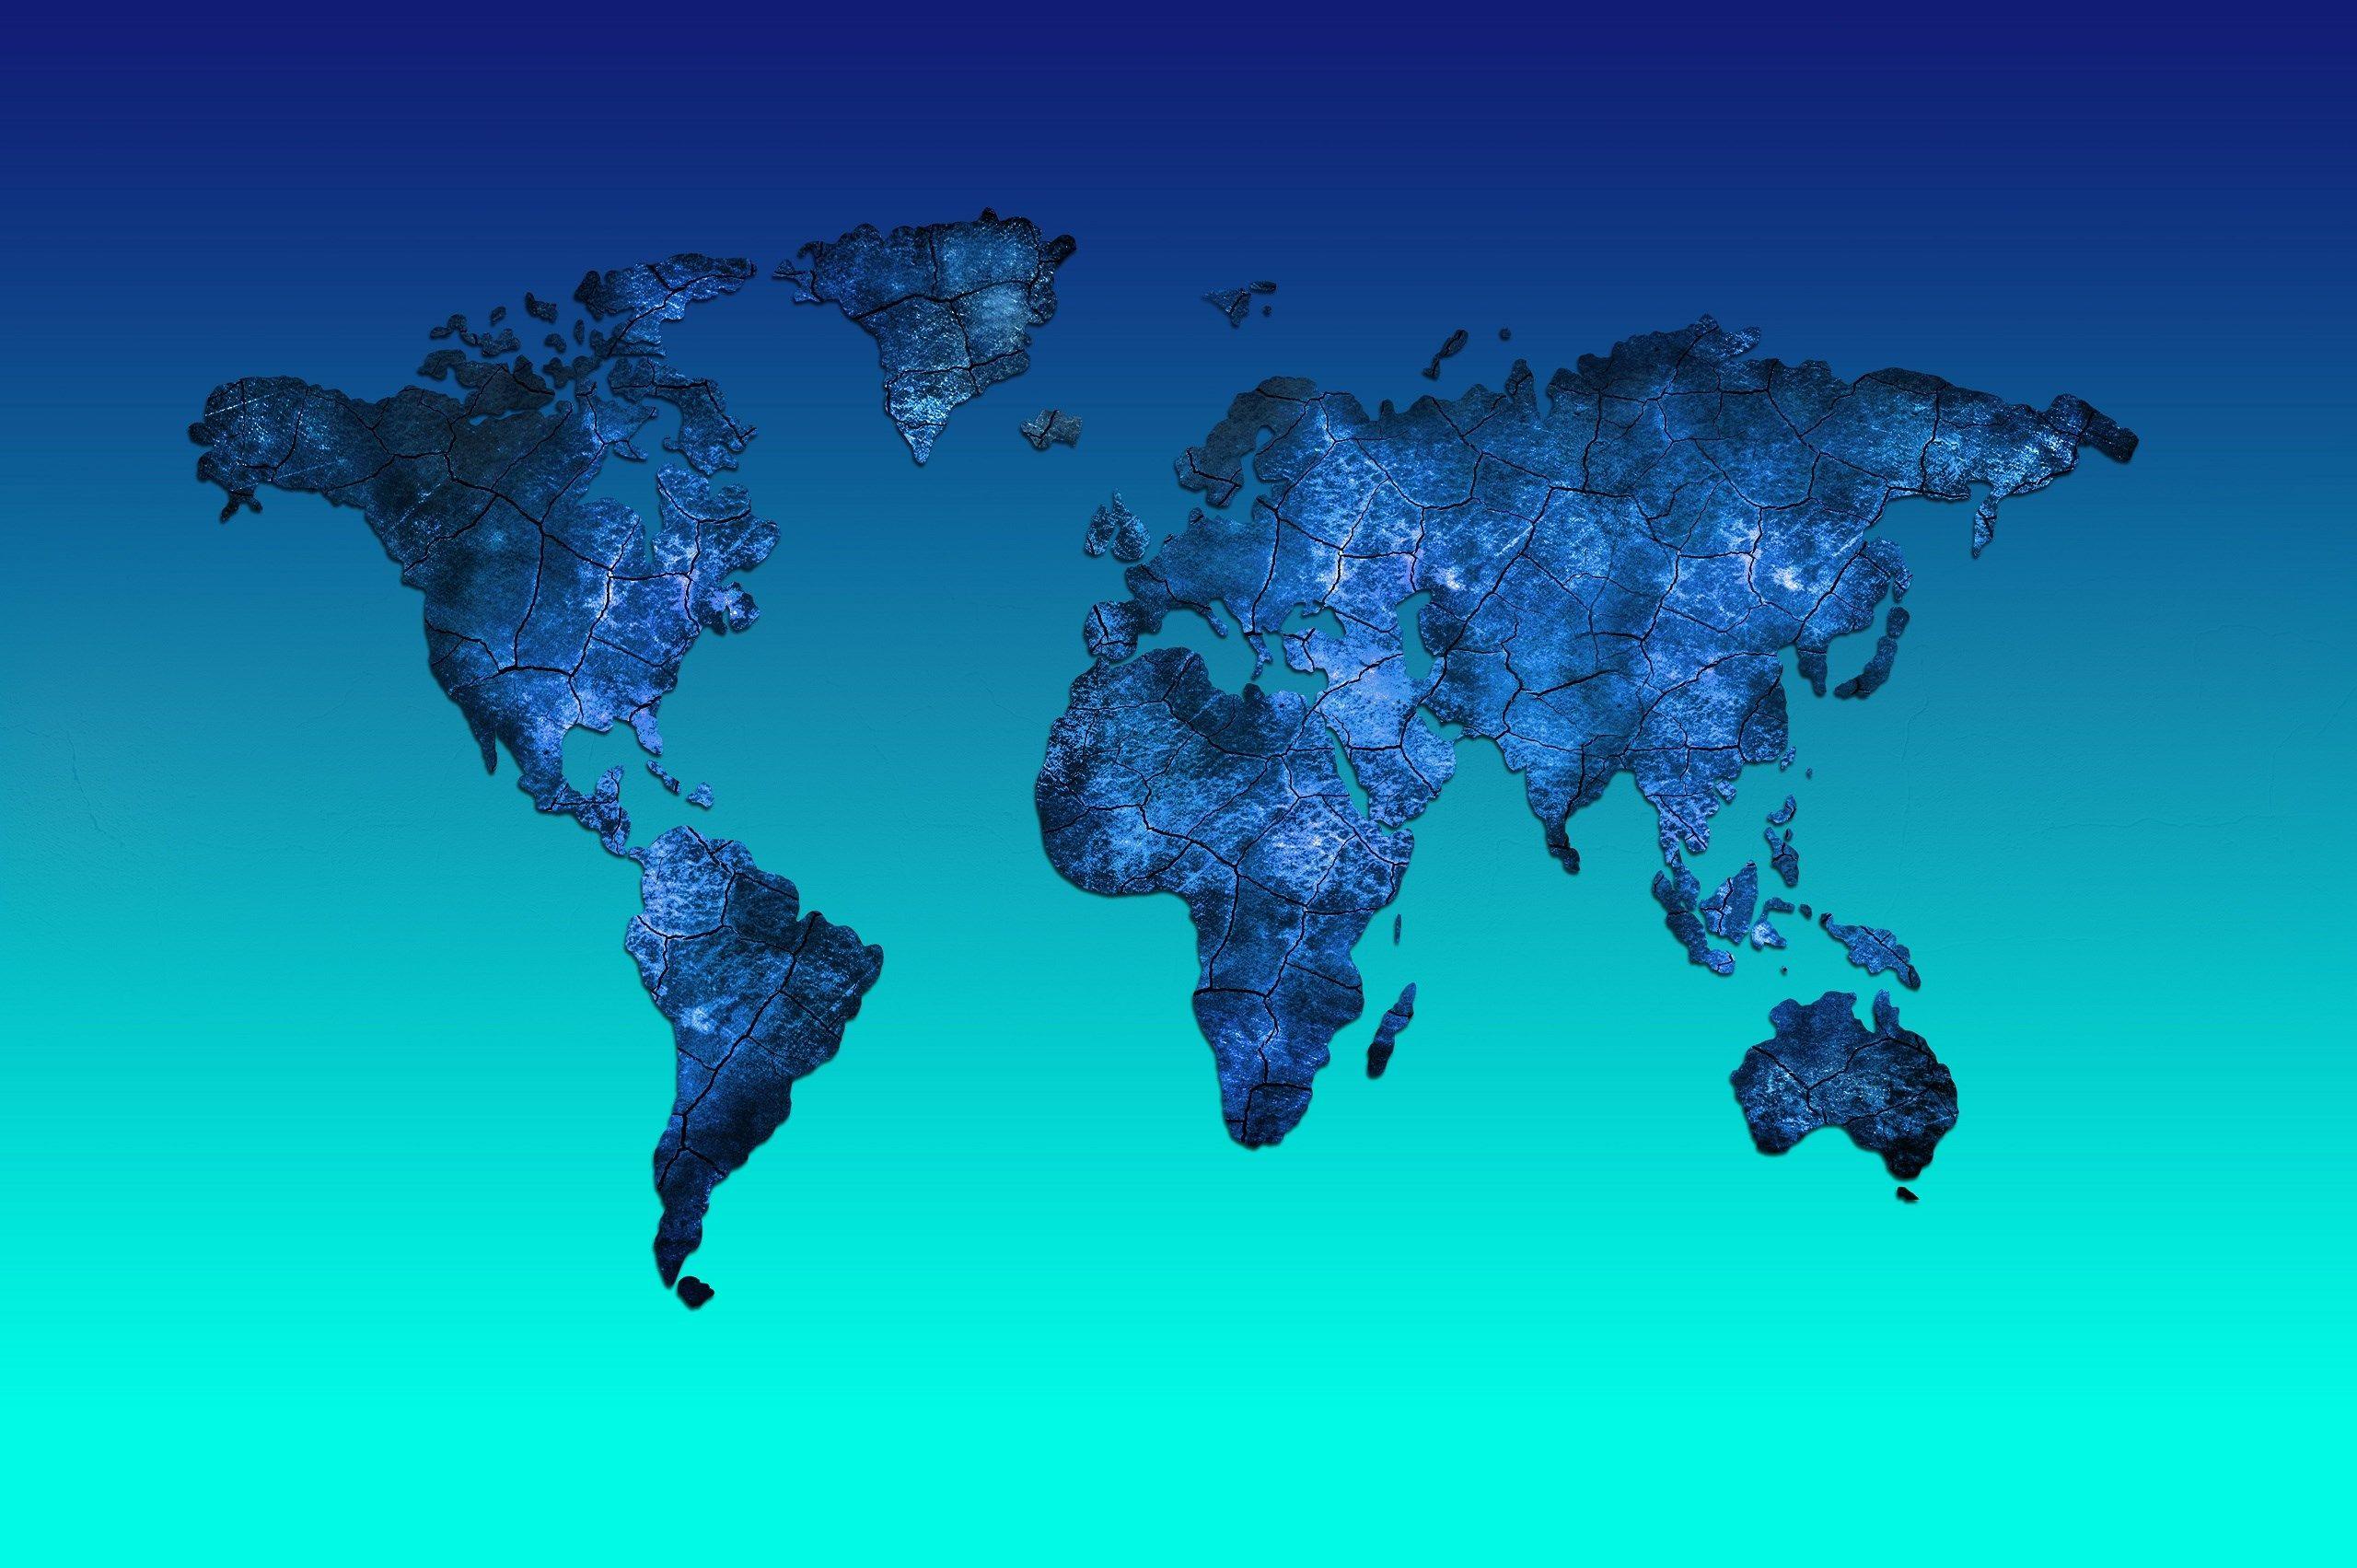 Amazing Wallpaper Macbook Map - 503a5c1cca54b92a048397eb64f83a51  Snapshot_43727.jpg